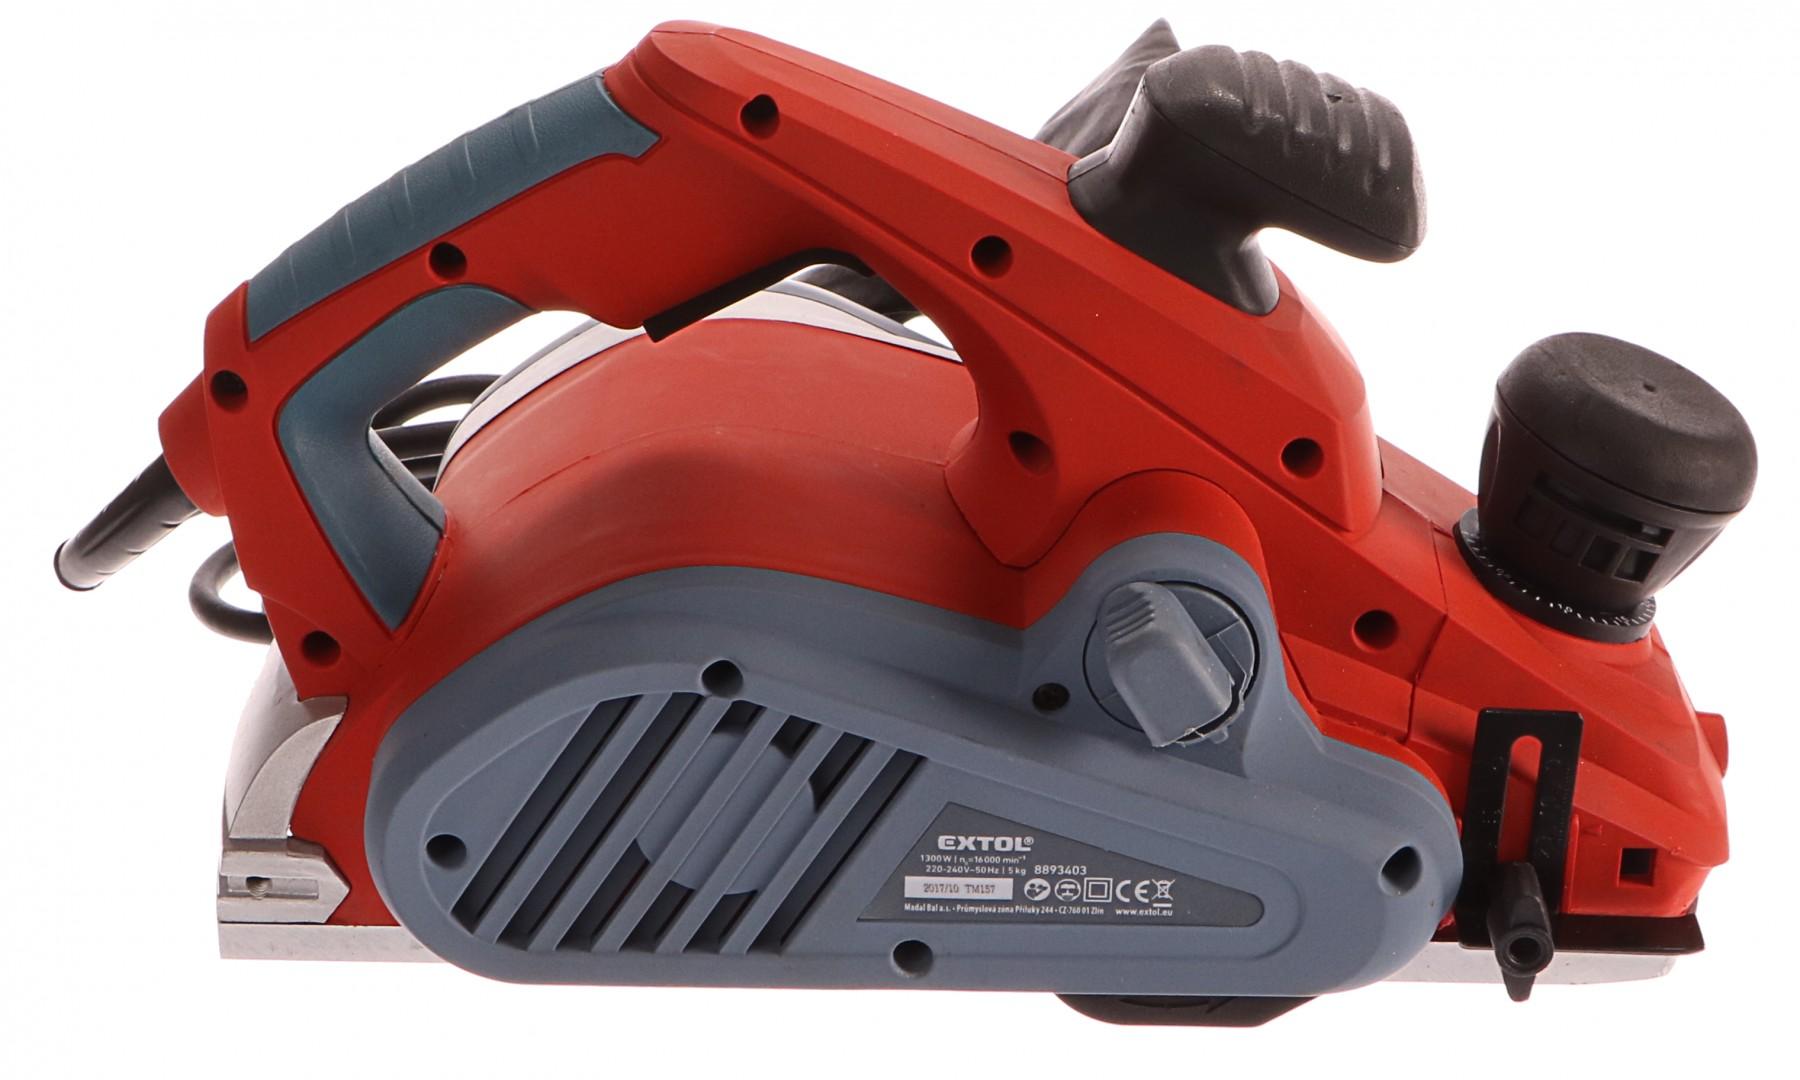 744120b25299d Hoblík, 1300W, 110mm, 0-3,5mm, EXTOL PREMIUM, EP 1300, 8893403 ...